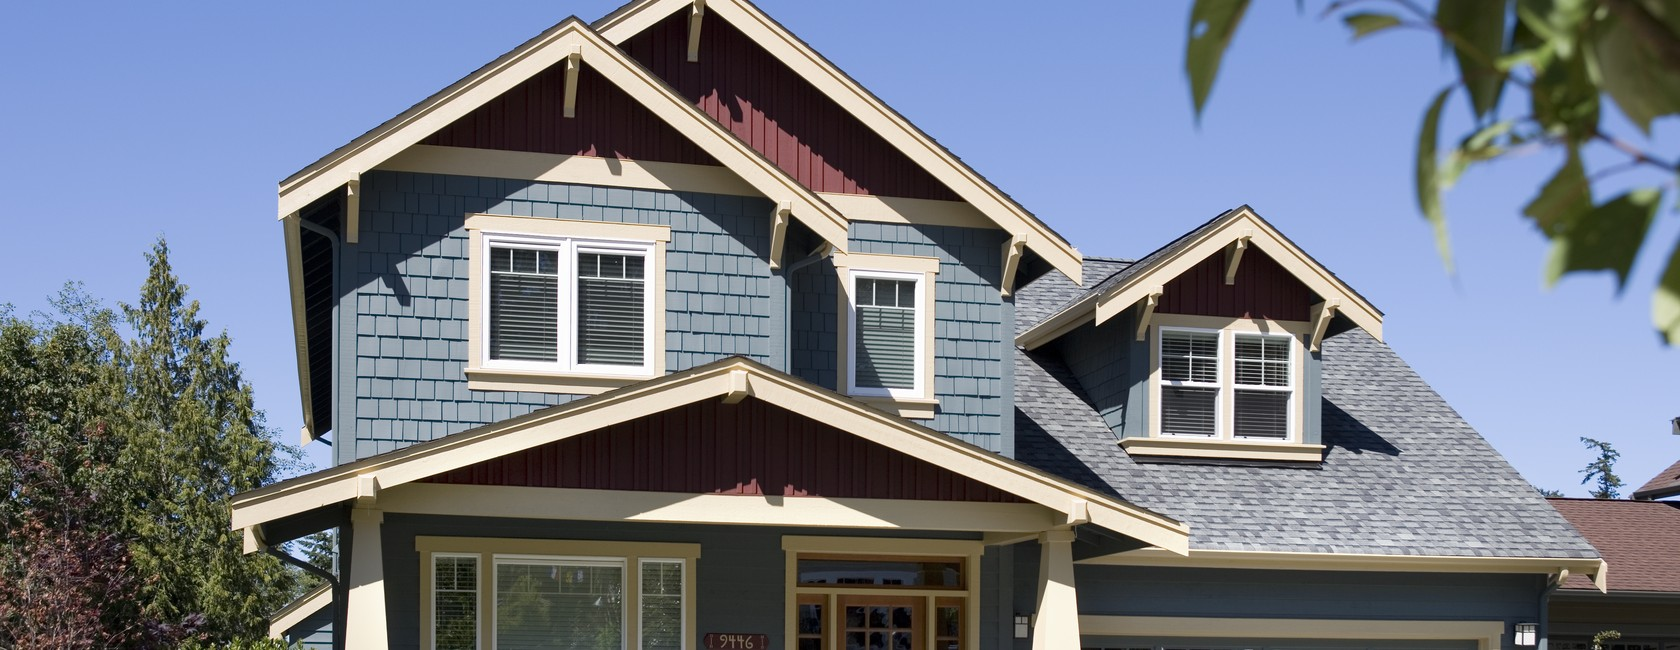 The Malone Stunning 2 Story Craftsman Home Plan